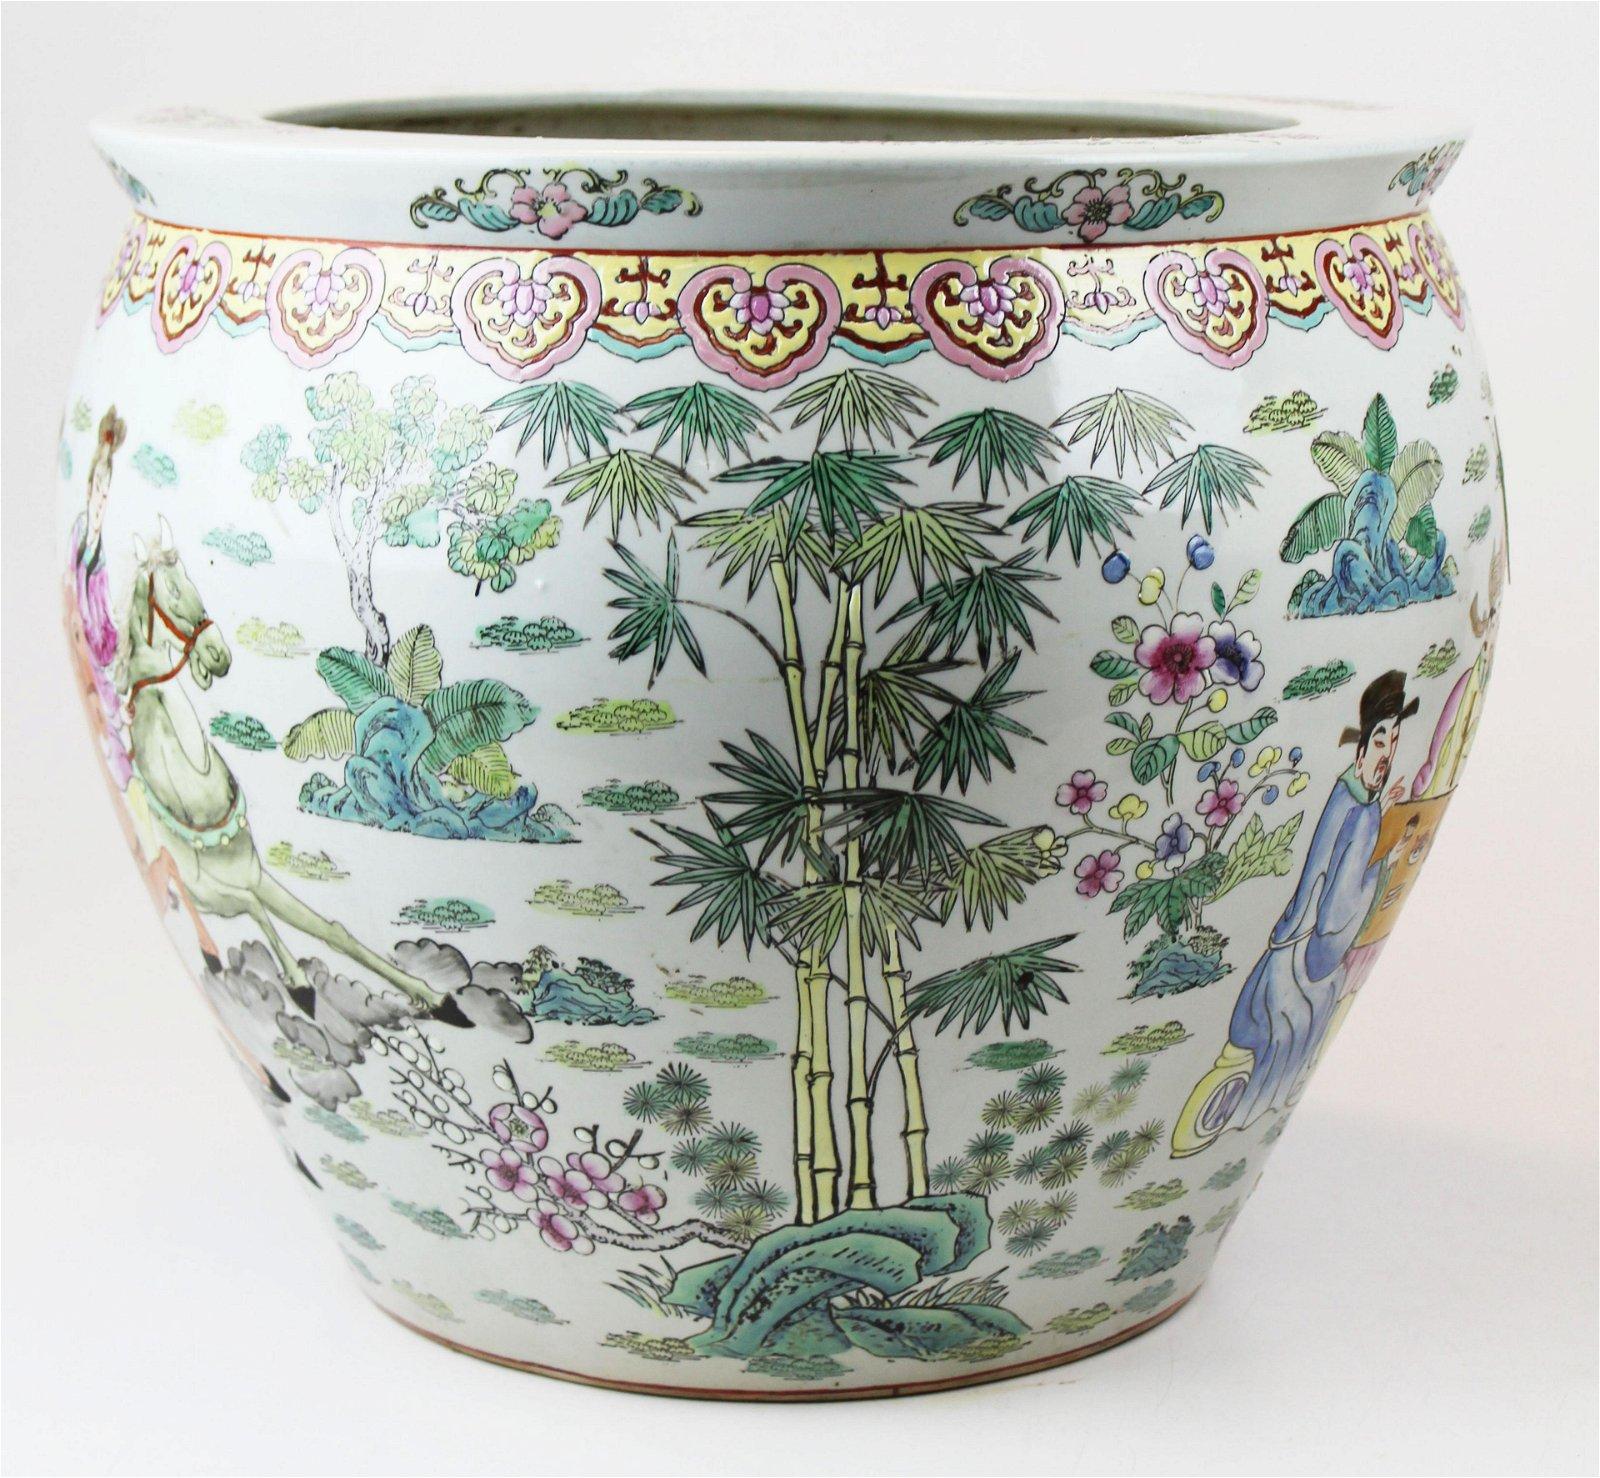 Chinese famille rose enamel decorated fish bowl